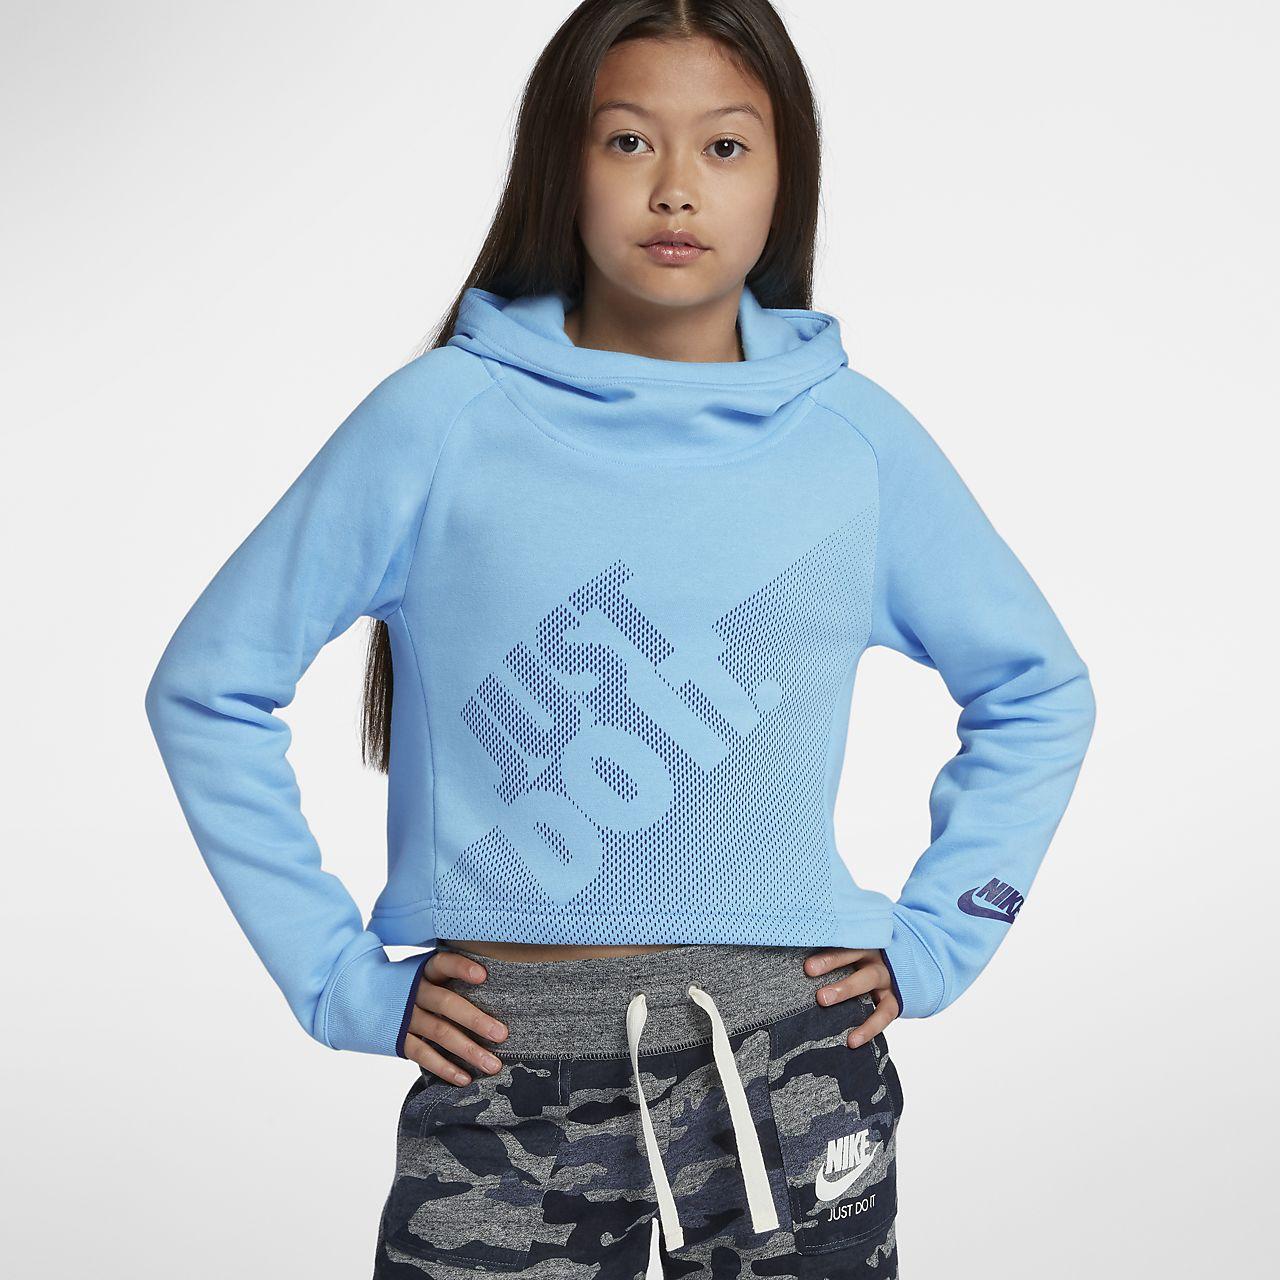 92c7428e3f Nike Sportswear Older Kids' (Girls') Cropped Pullover Hoodie. Nike ...